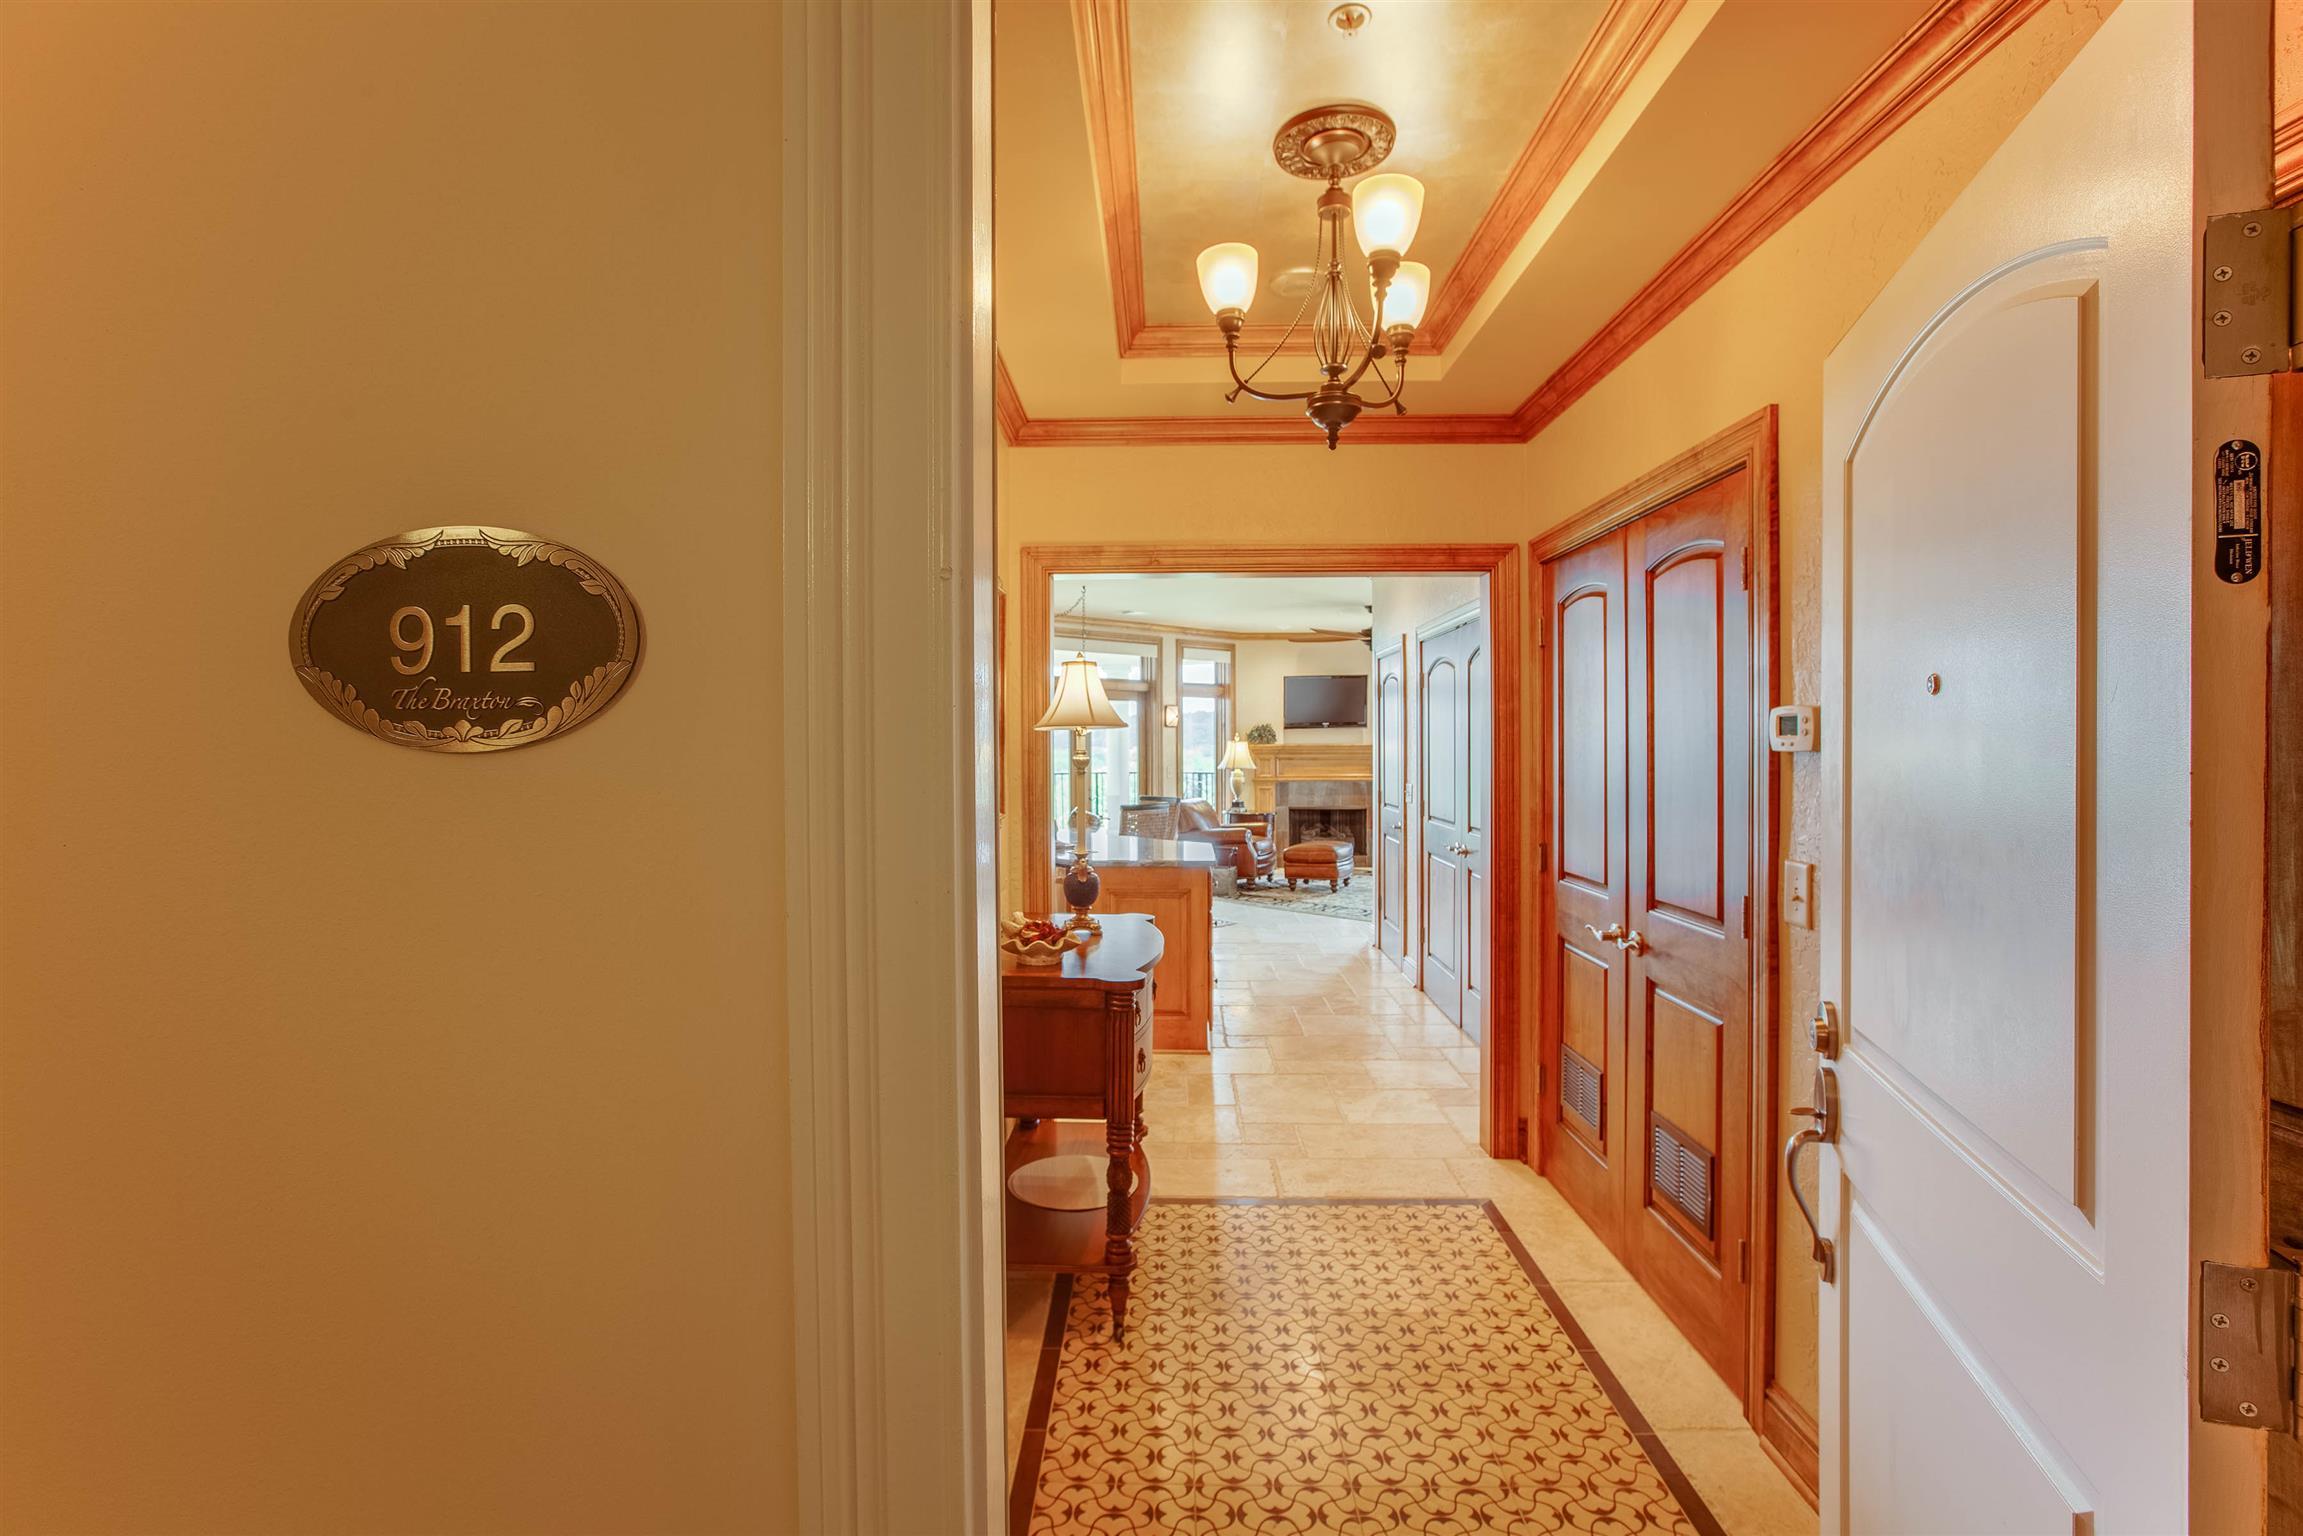 400 Warioto Way Apt 912, Ashland City, TN 37015 - Ashland City, TN real estate listing